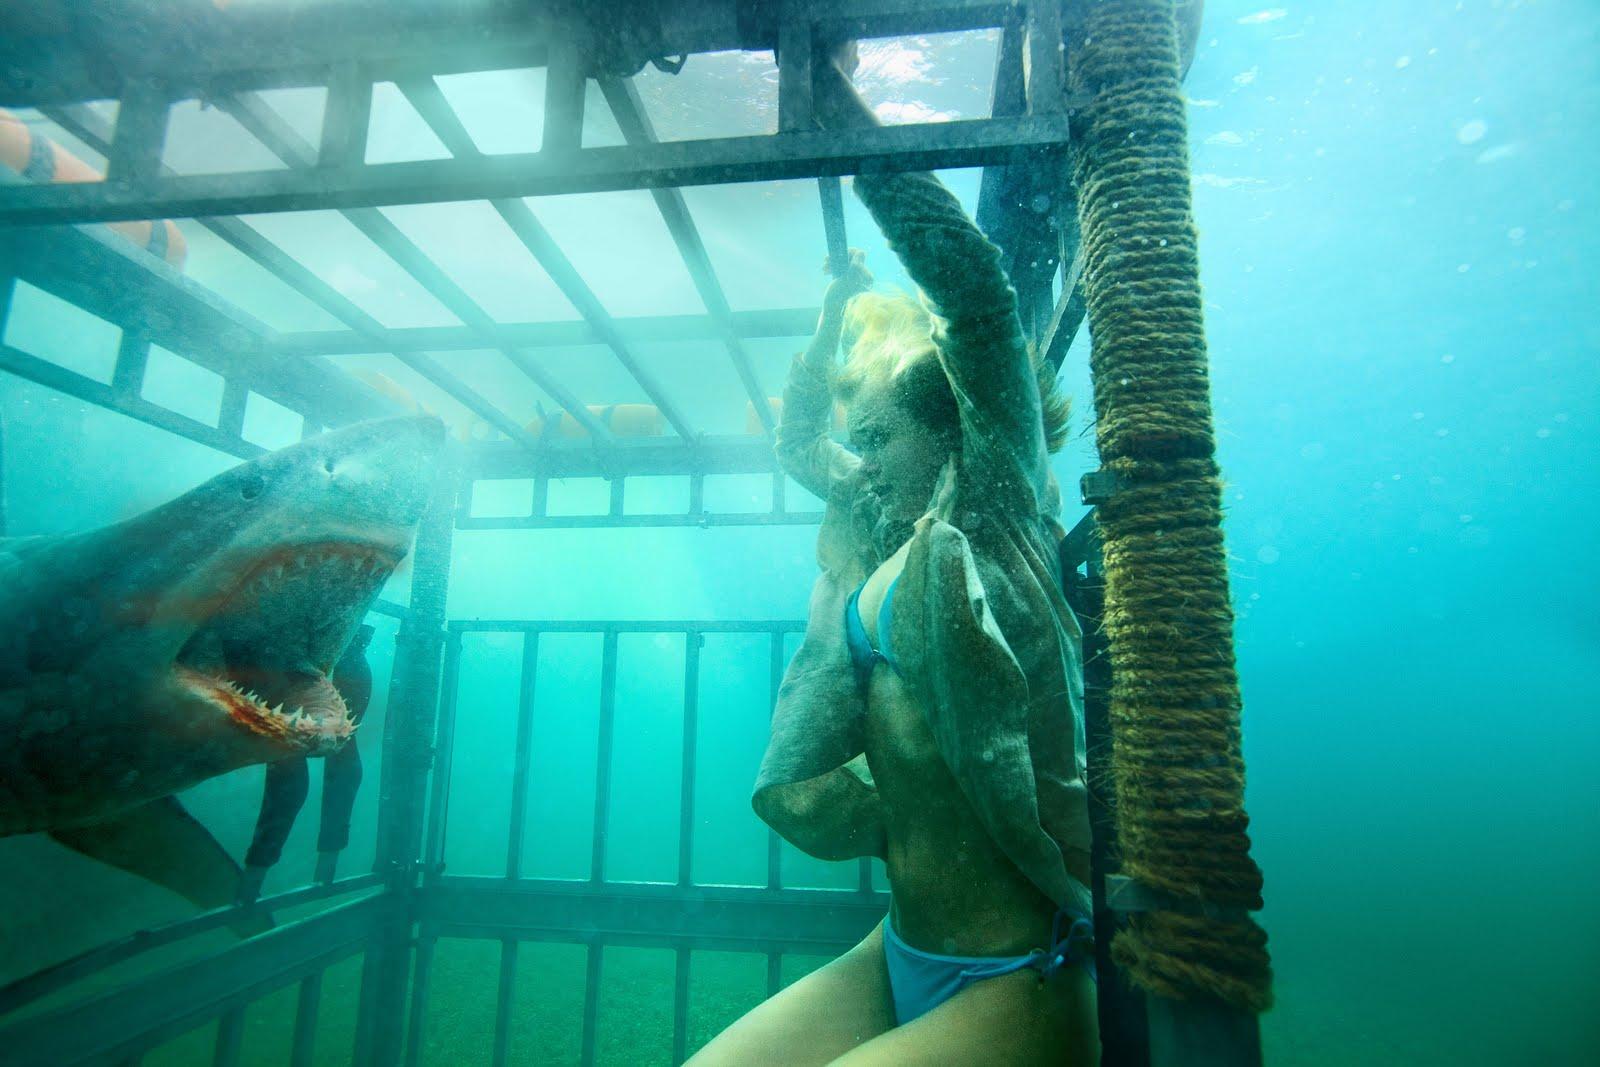 movie shark porn Cringe lifeguard scene goes viral | Daily.